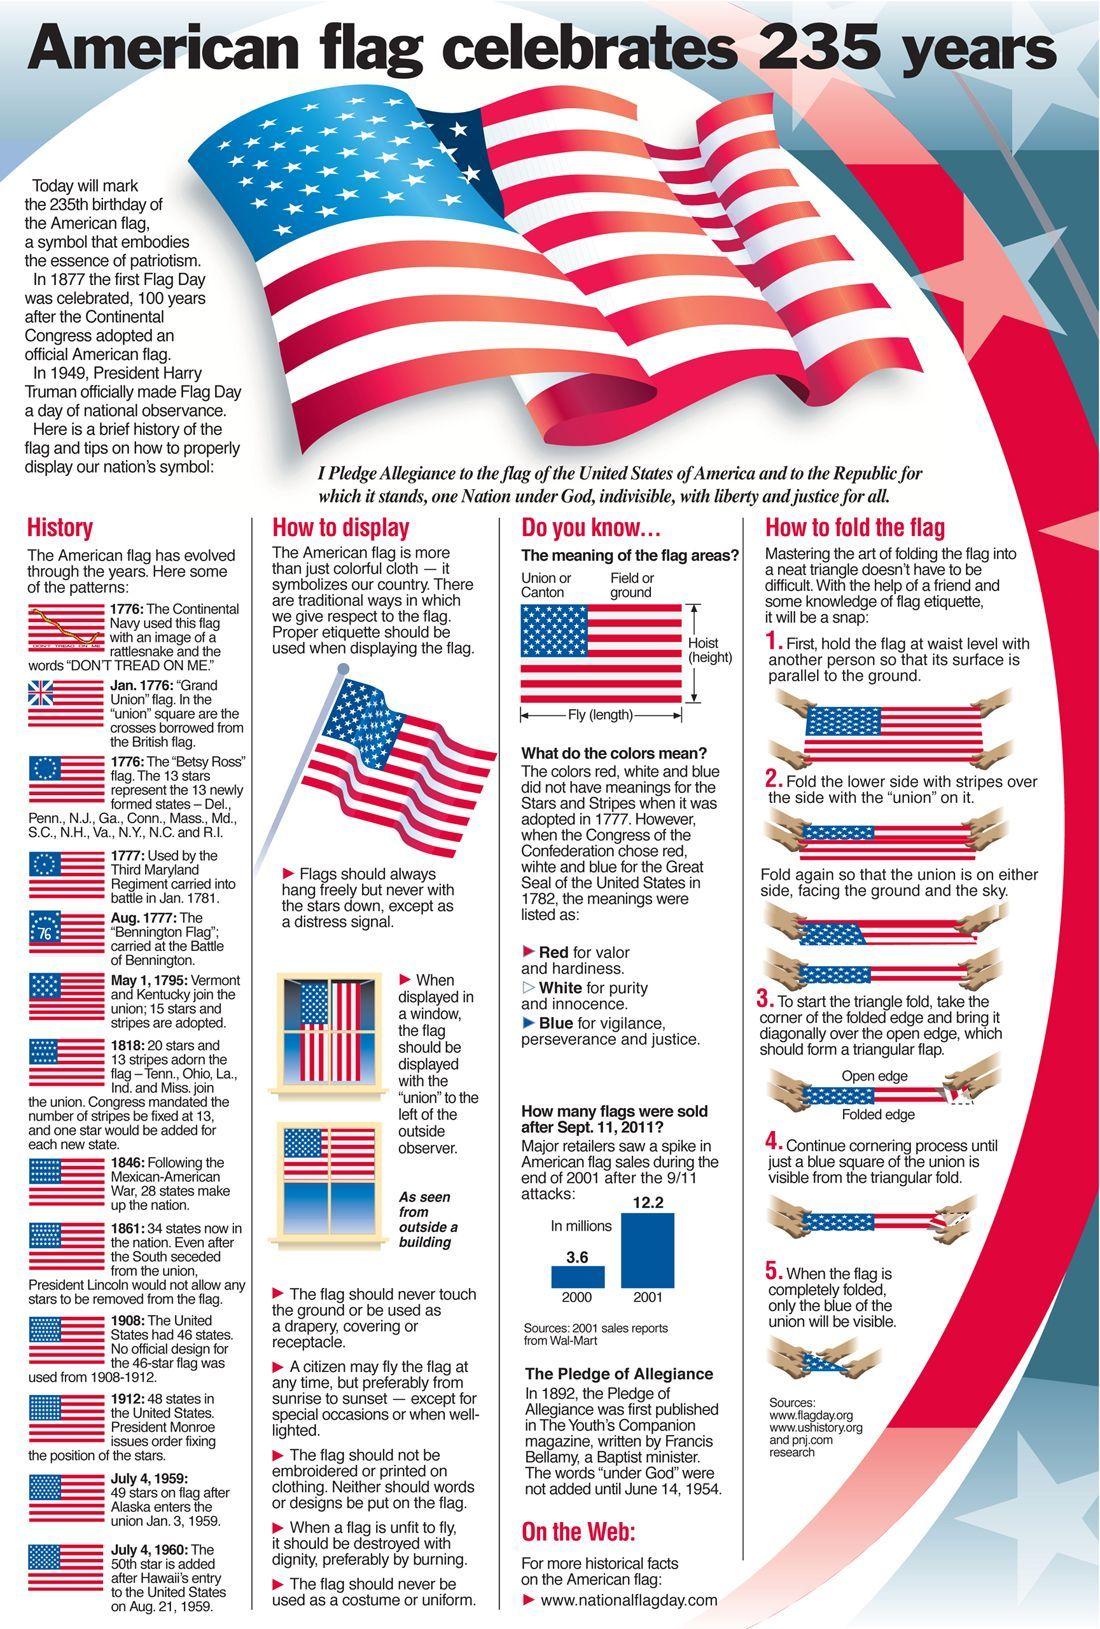 Image Result For American Flag Celebrates 235 Years American Flag History American Heritage Girls Flag Etiquette